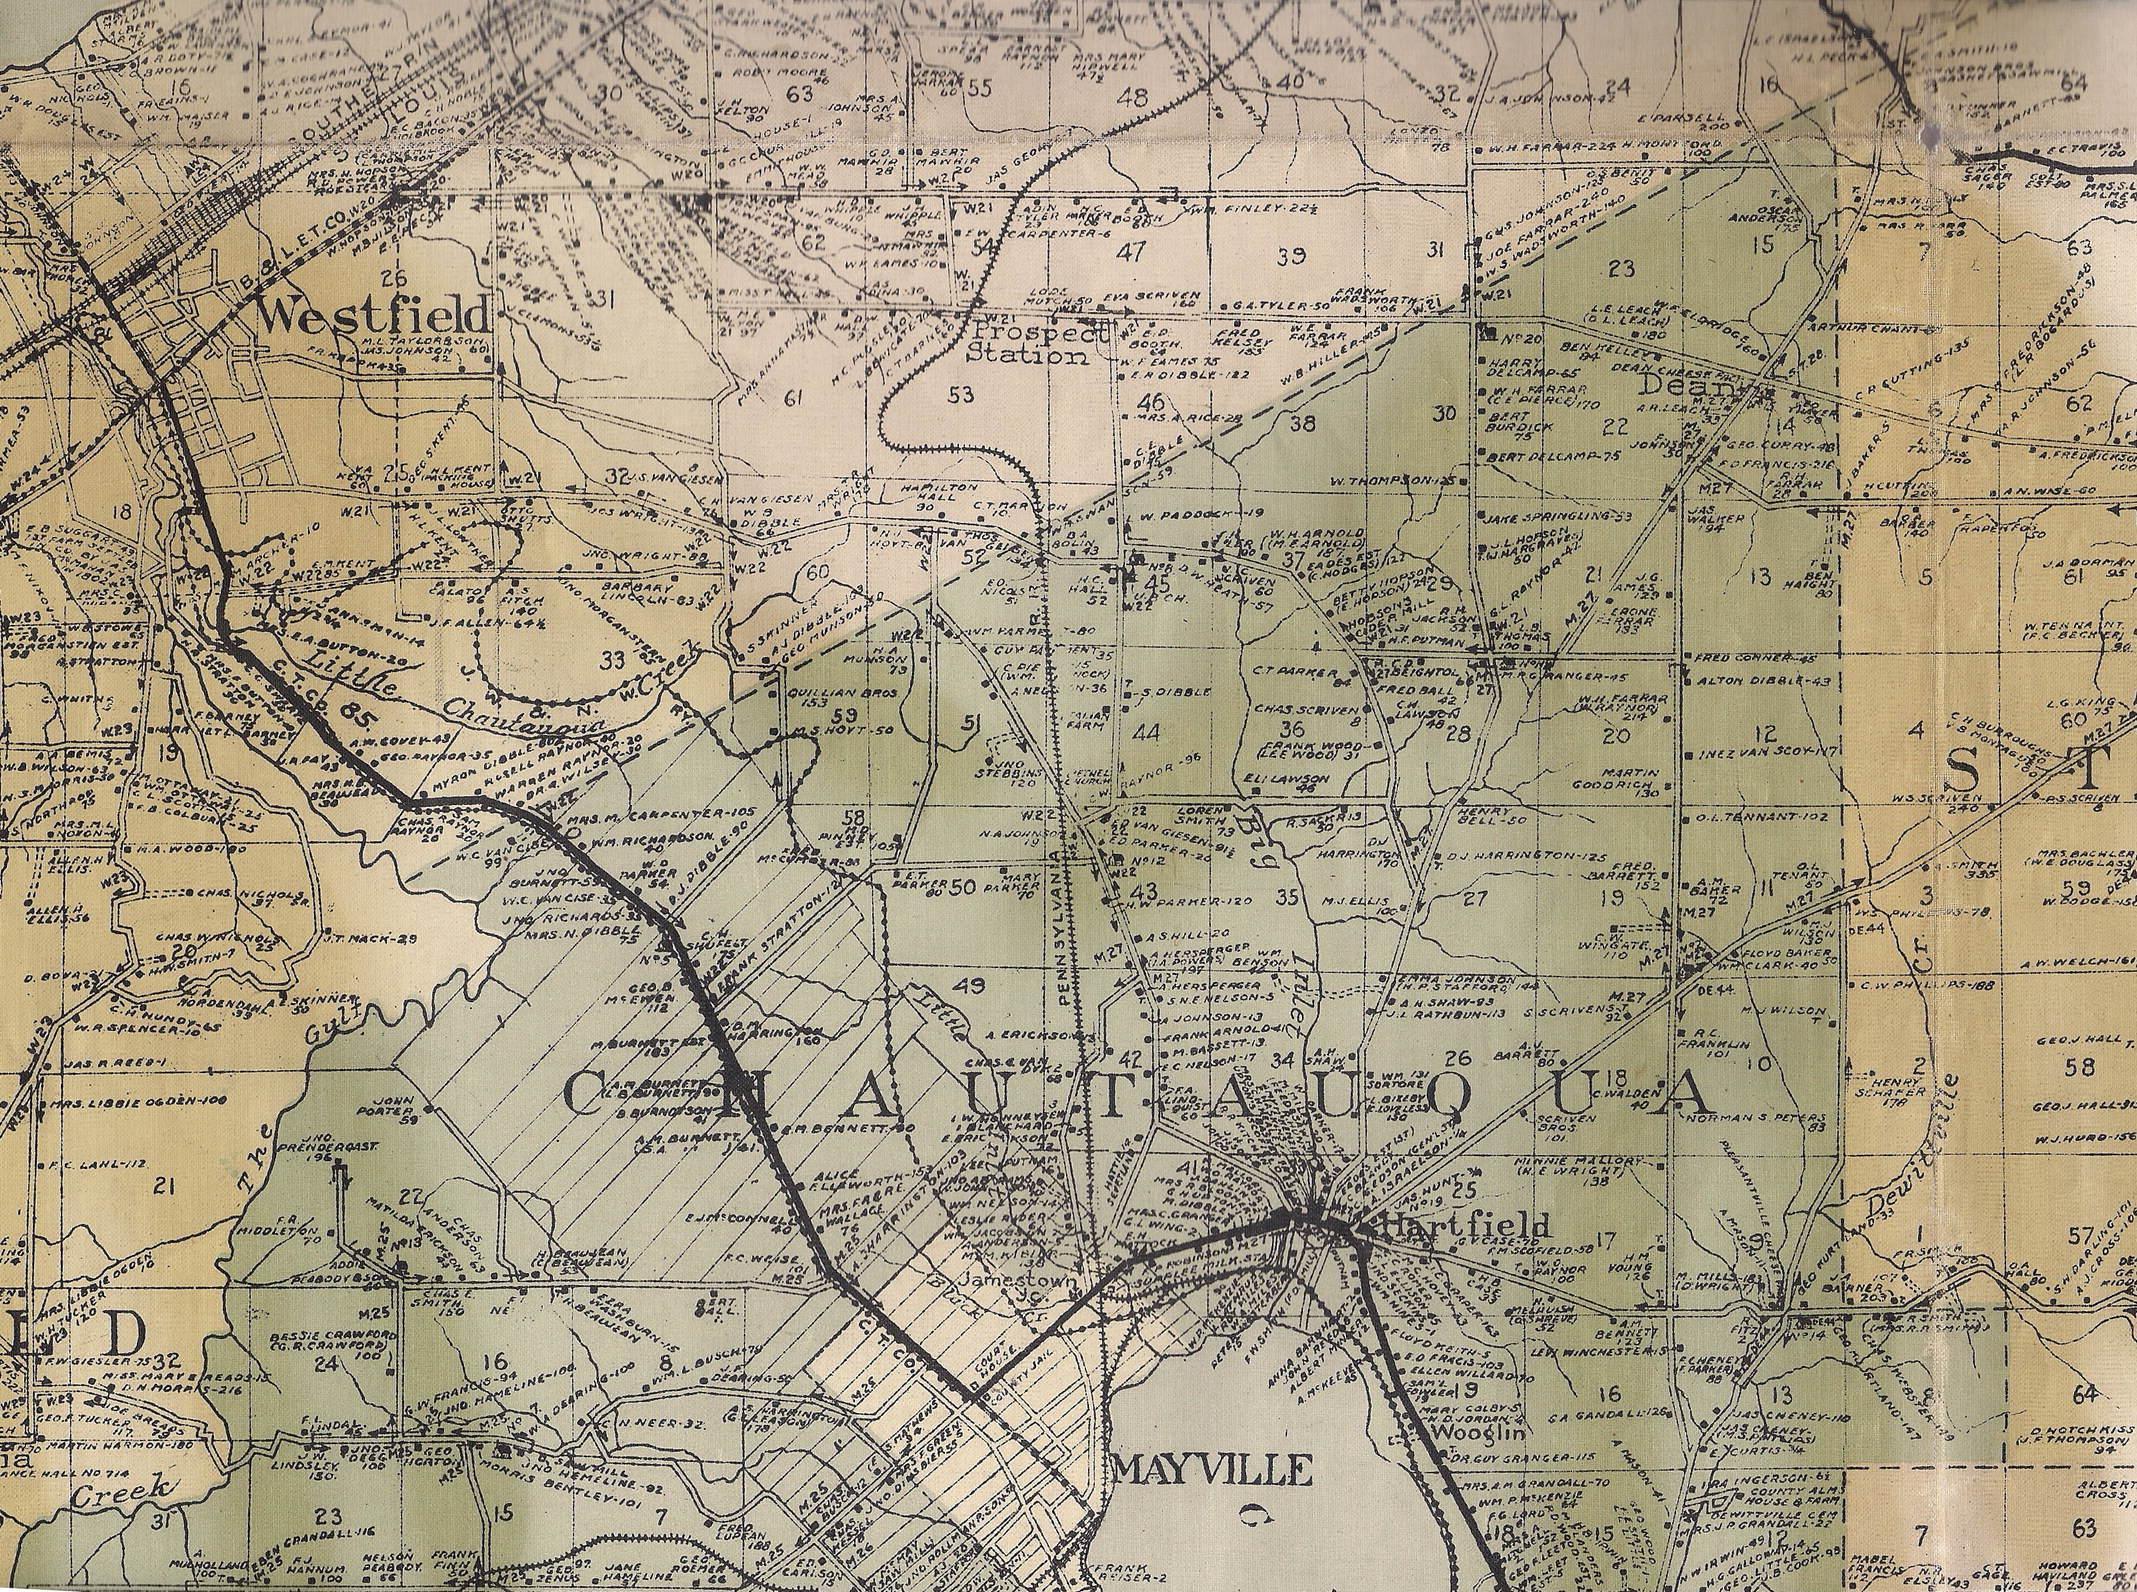 1916 Wall Map of Chautauqua County, NY Chautauqua County Map on